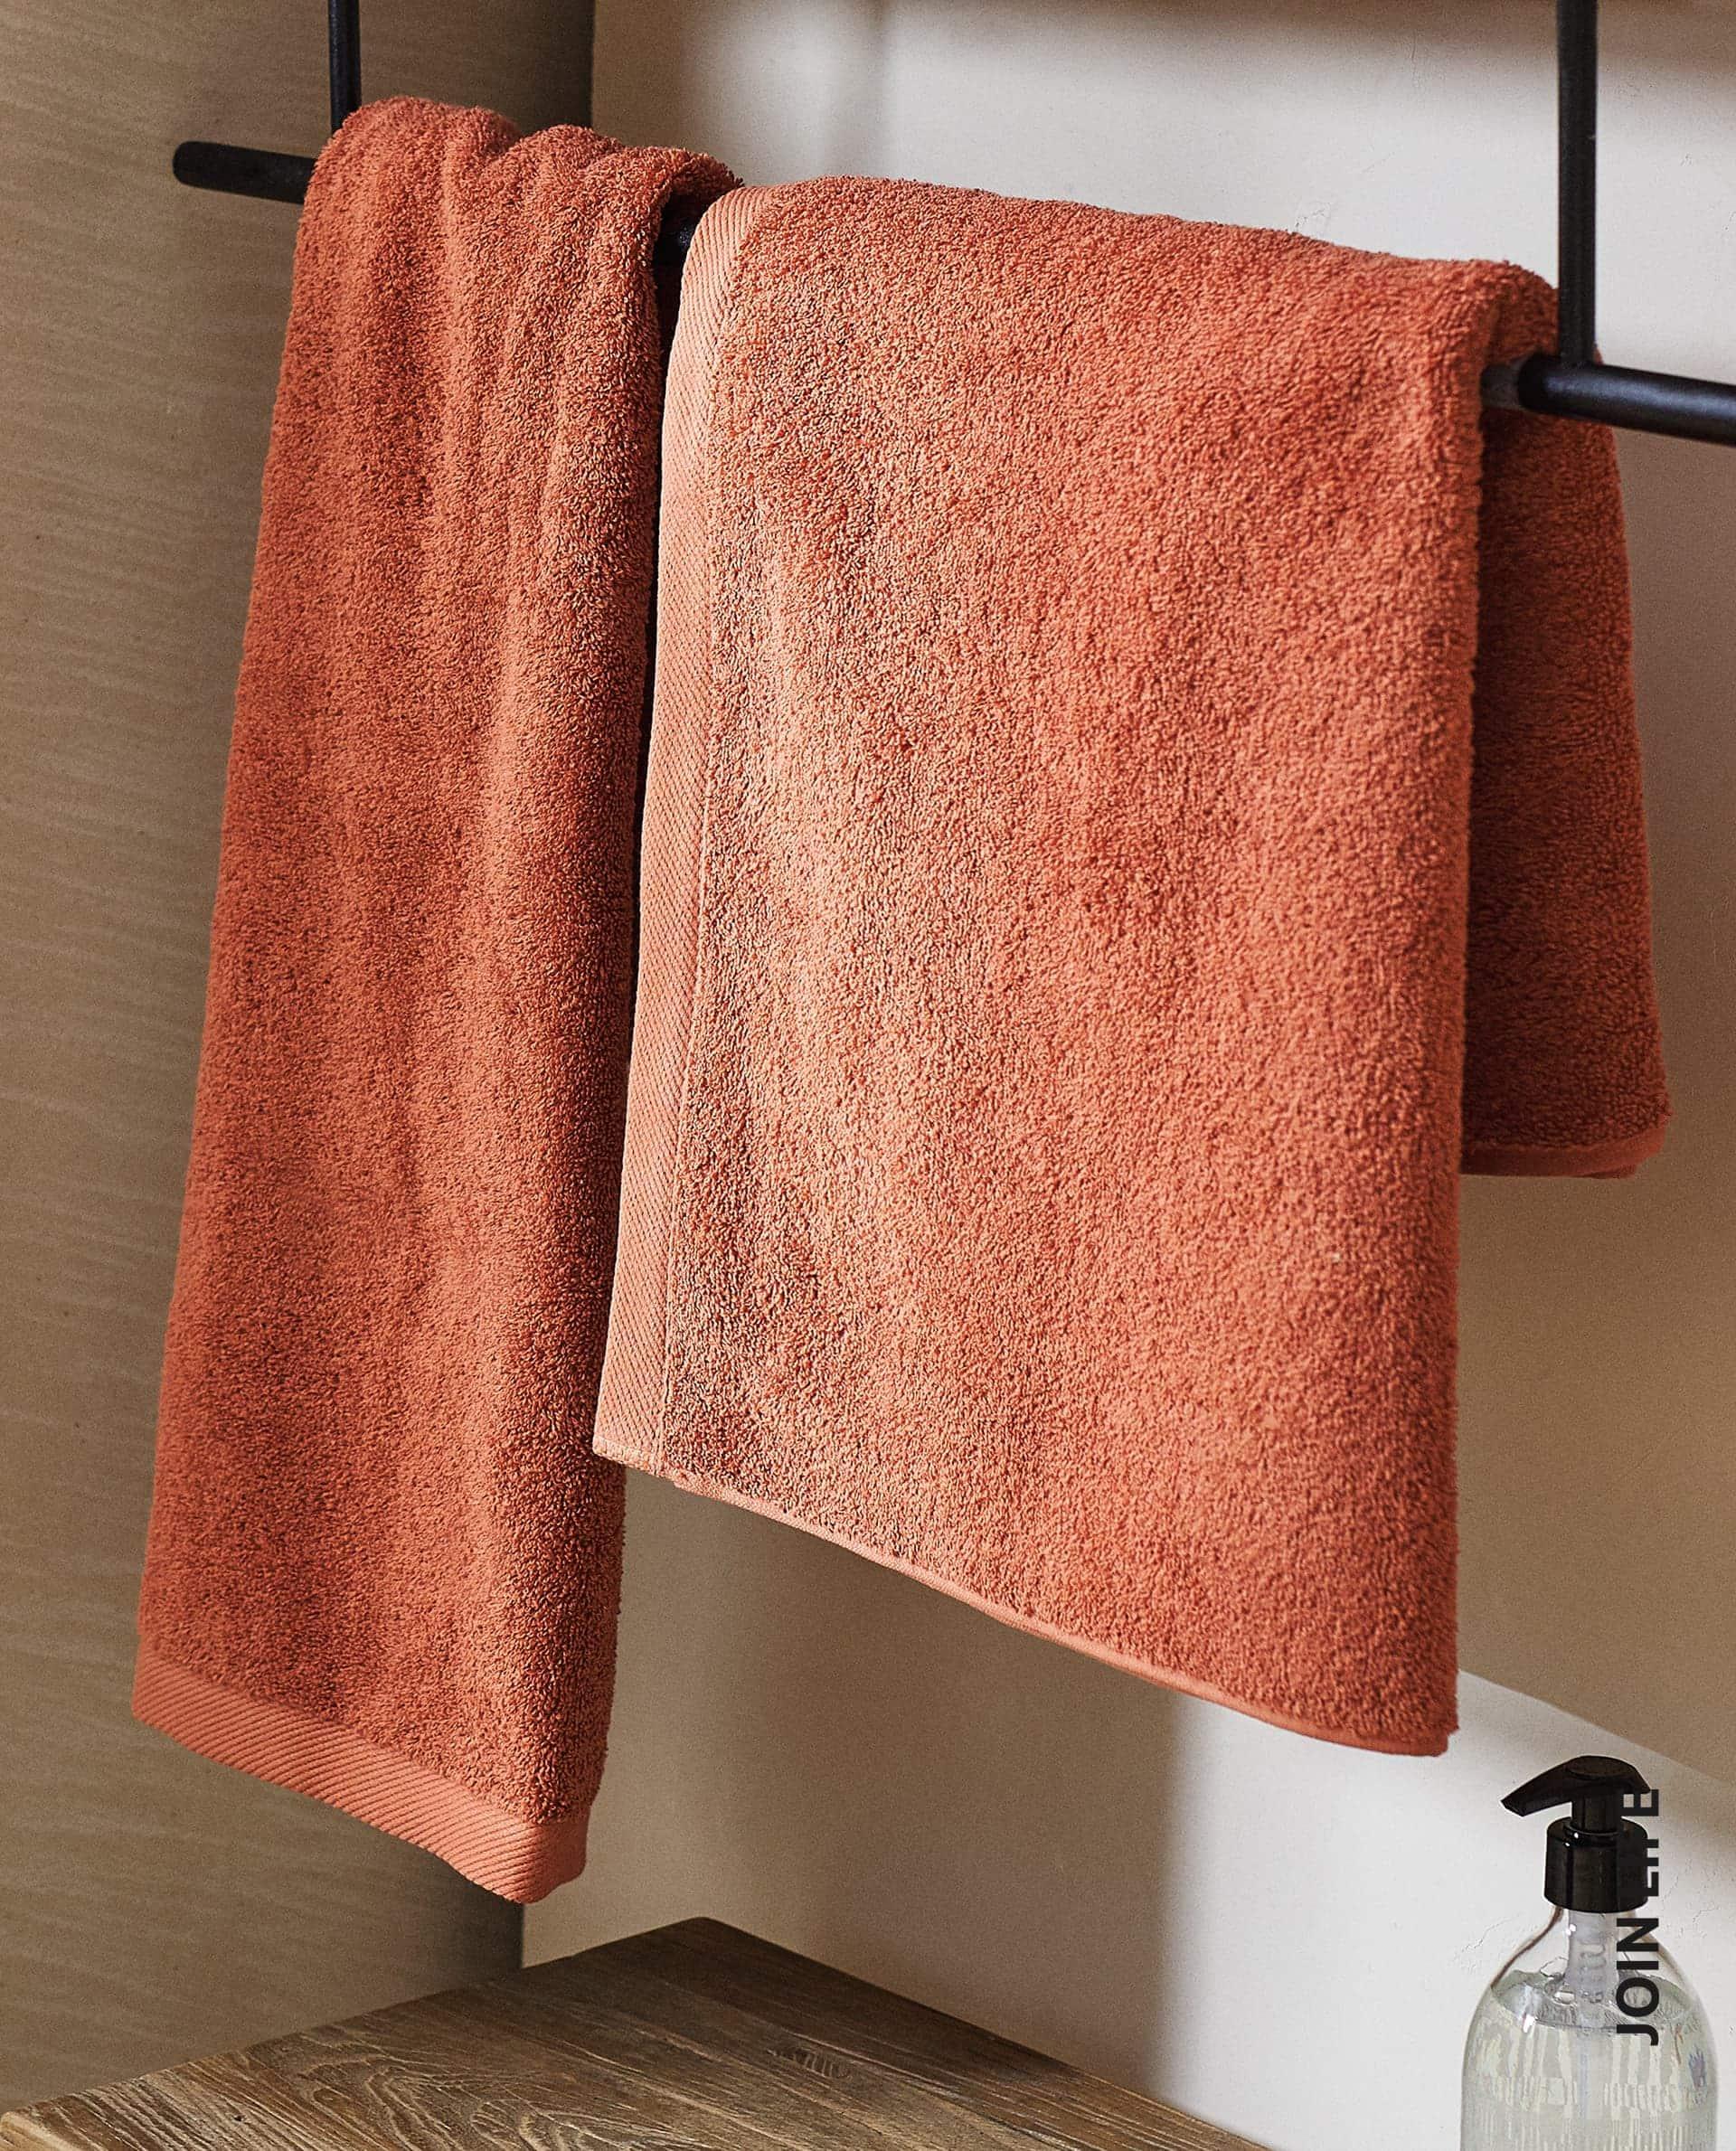 ECOLOGICALLY GROWN COTTON TOWEL - TOWELS - BATHROOM   Zara Home საქართველო  / Georgia